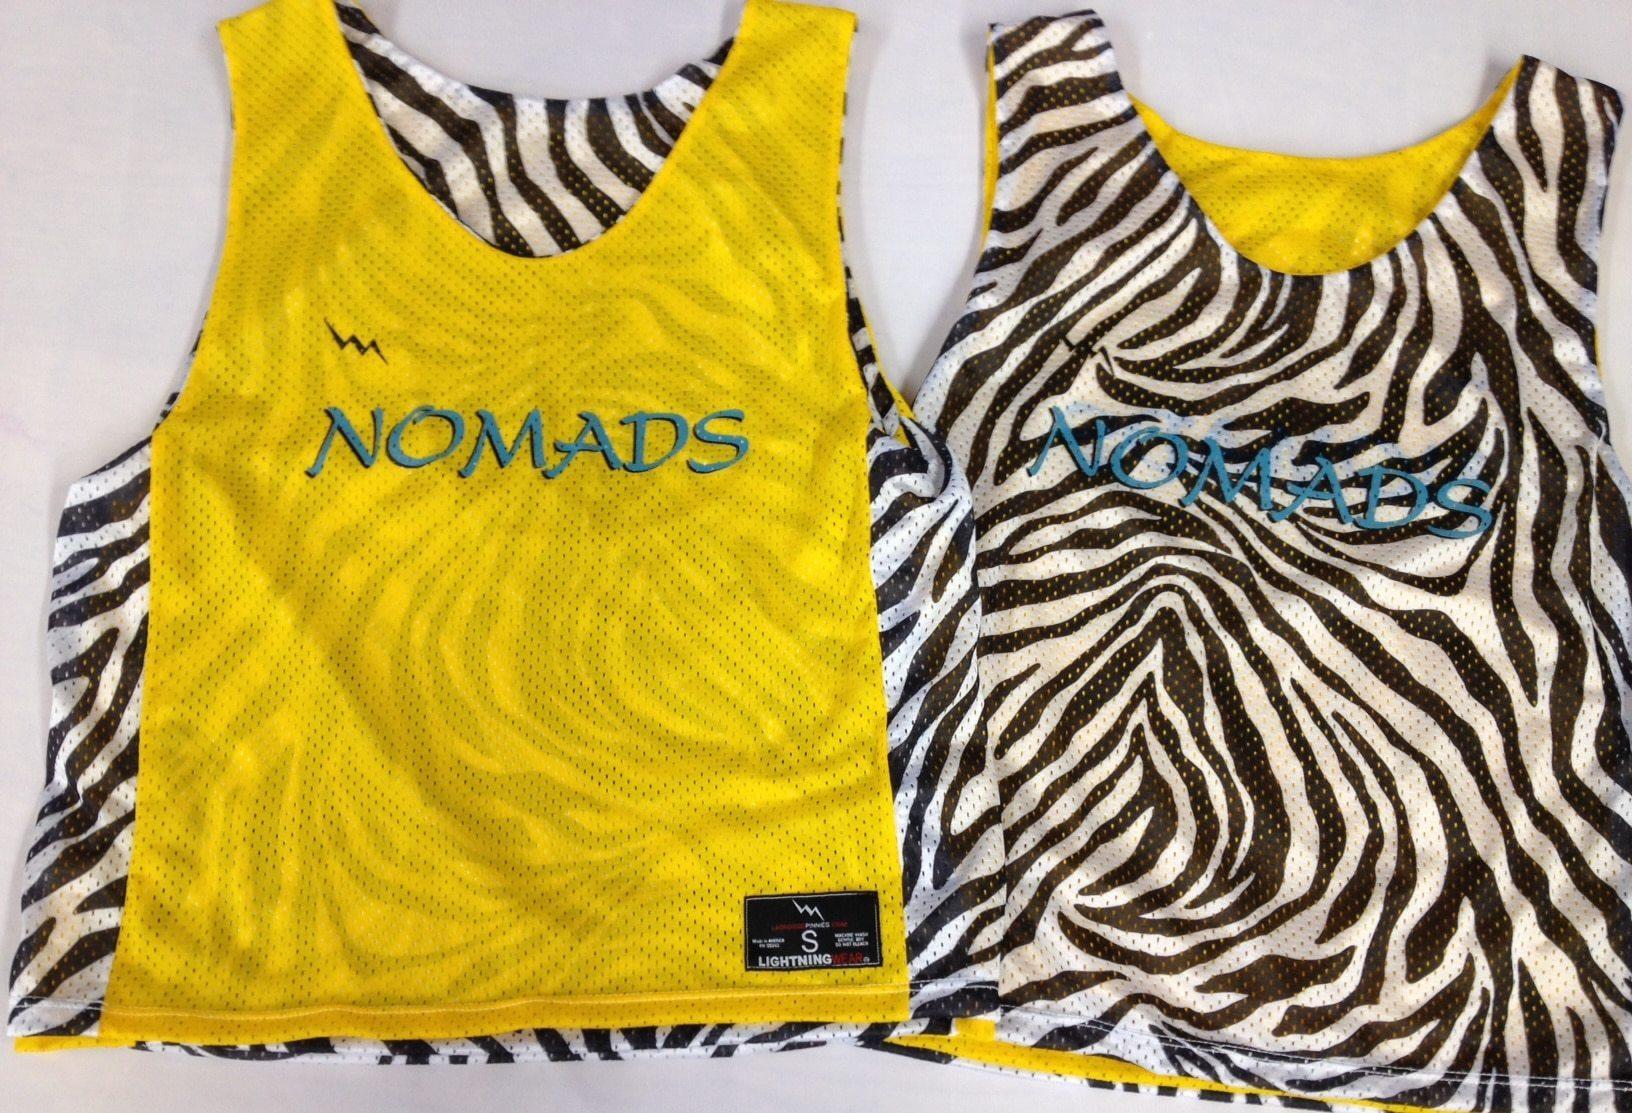 nomads pinnies